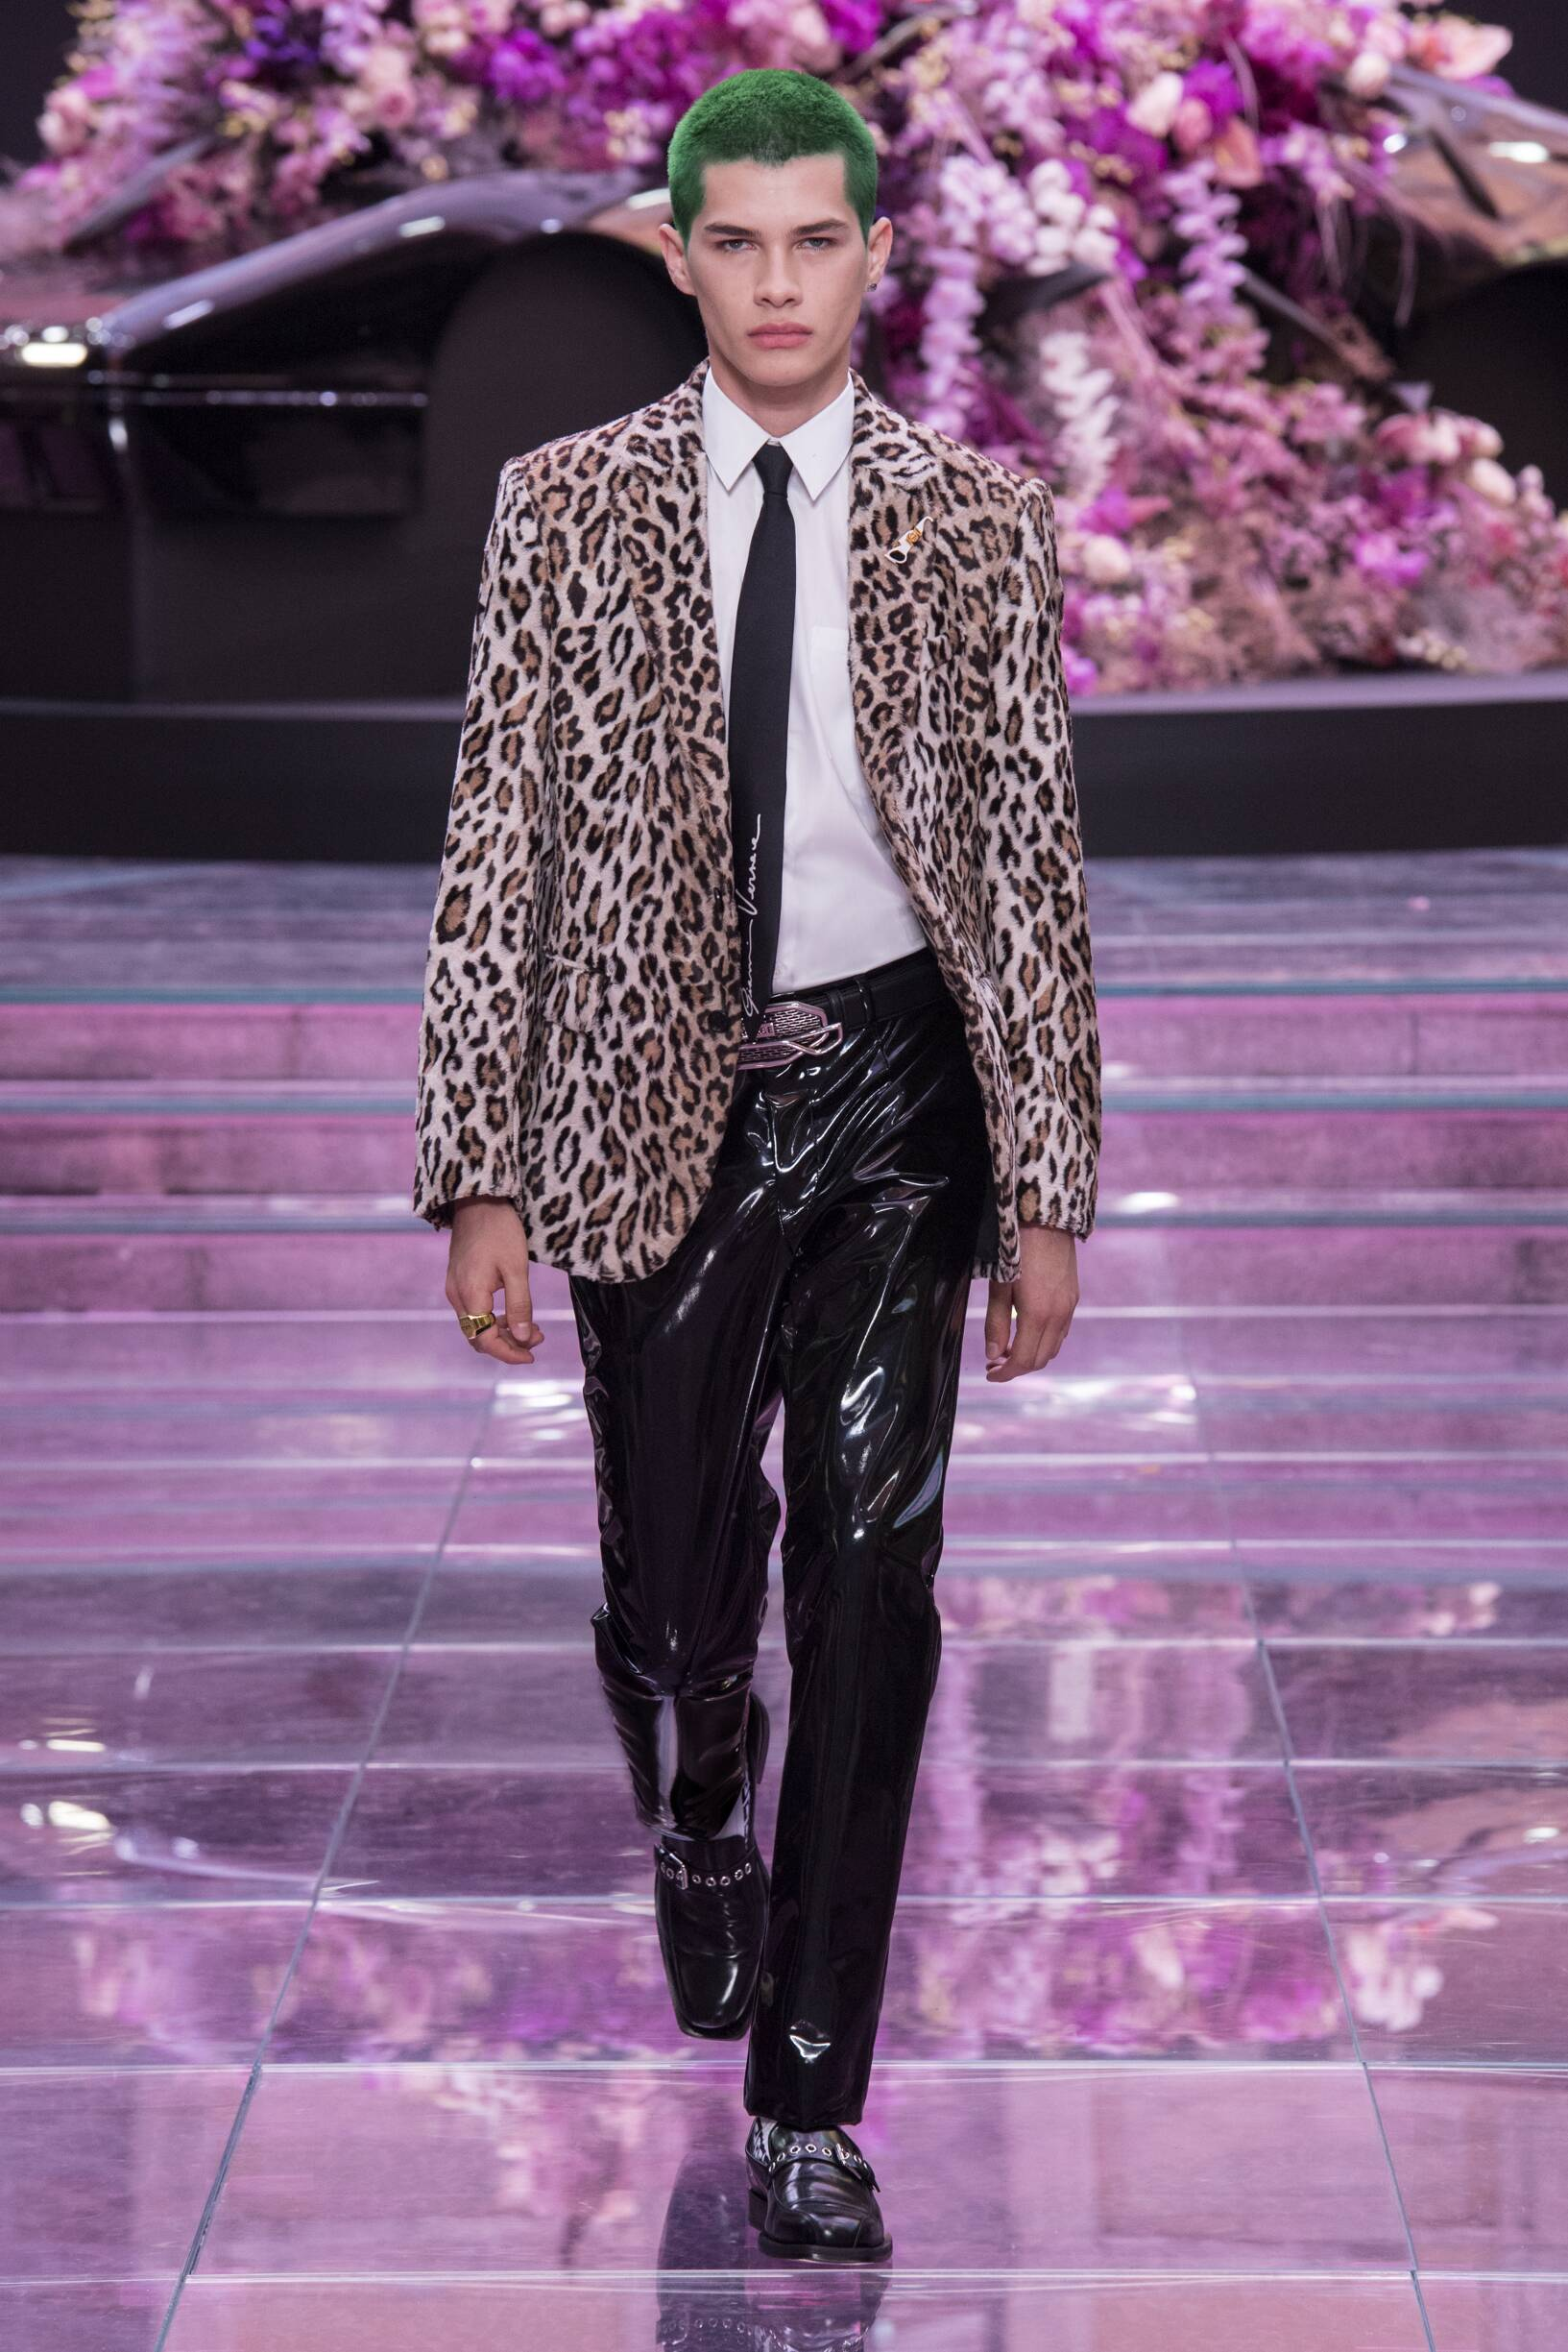 Fashion Man Model Versace Catwalk